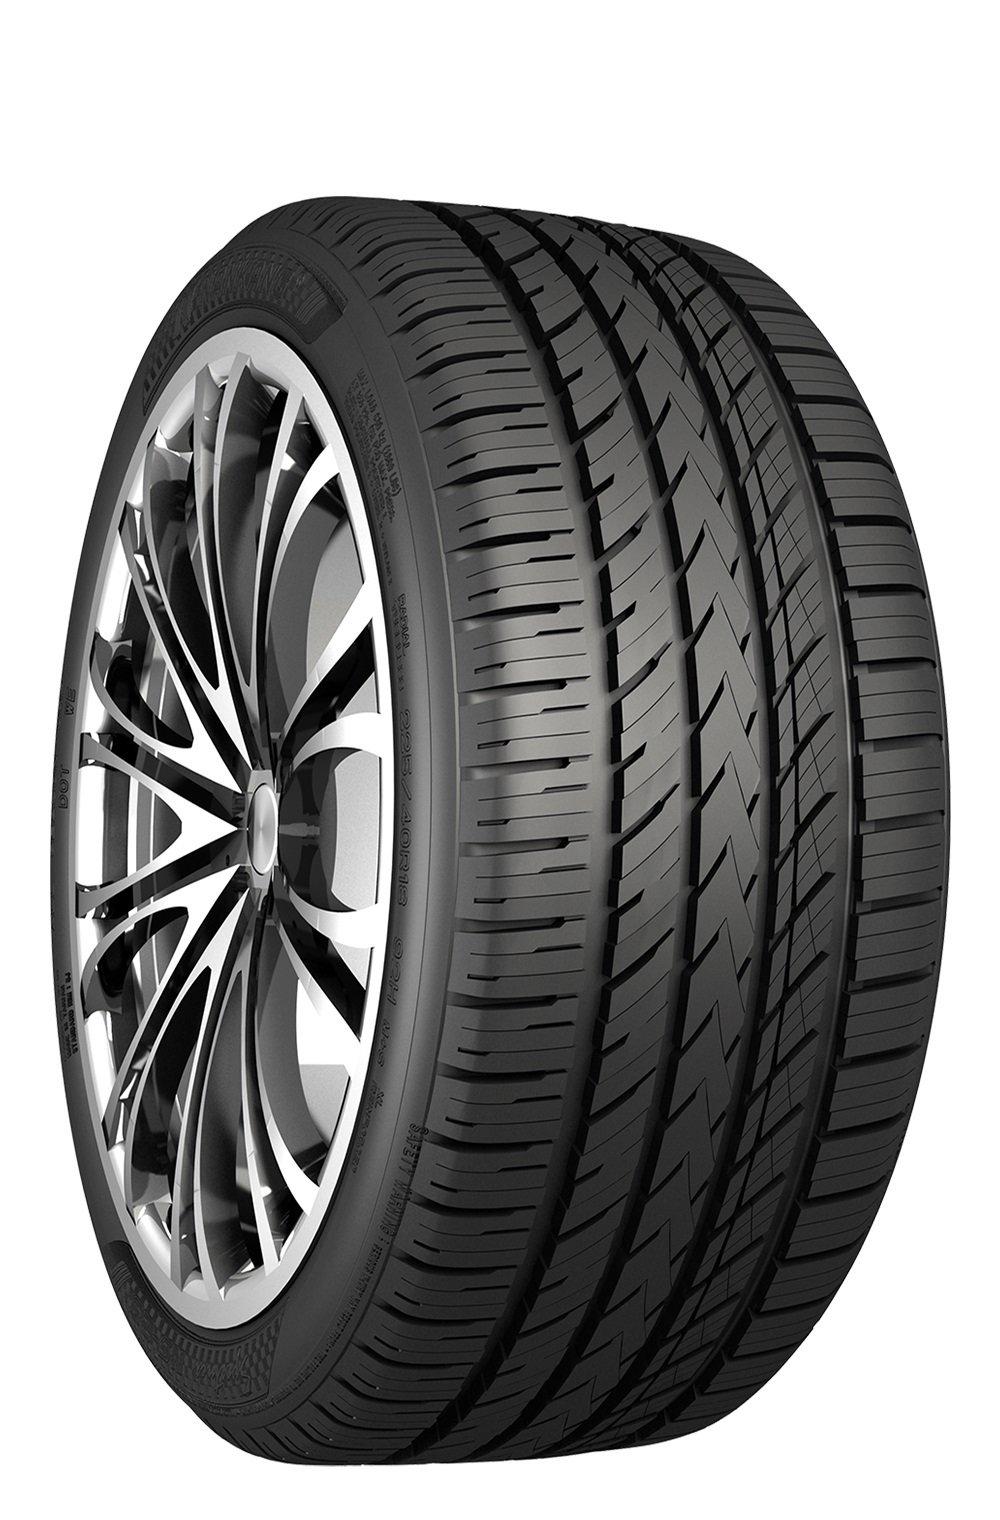 Nankang NS-25 All-Season UHP Performance Radial Tire - 205/45R17 88V